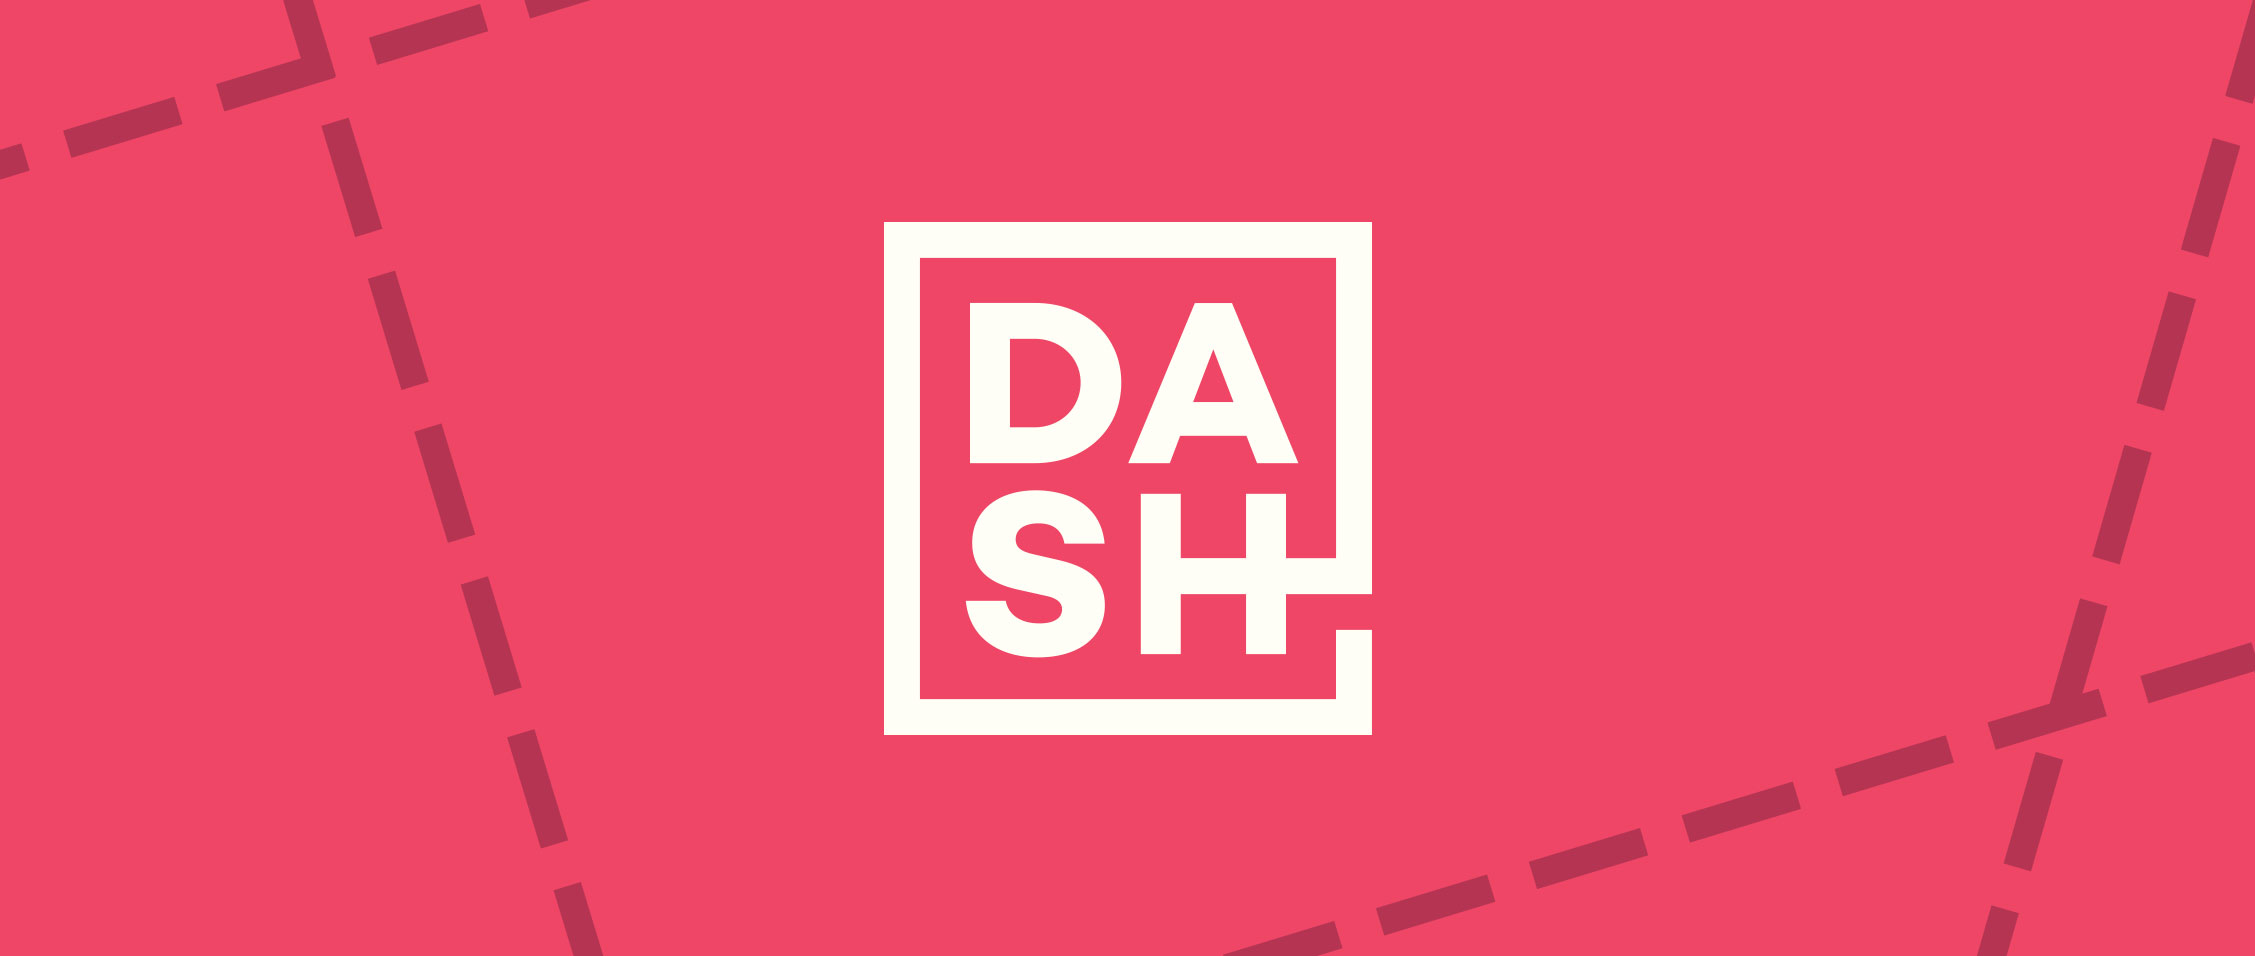 DASH - Identity